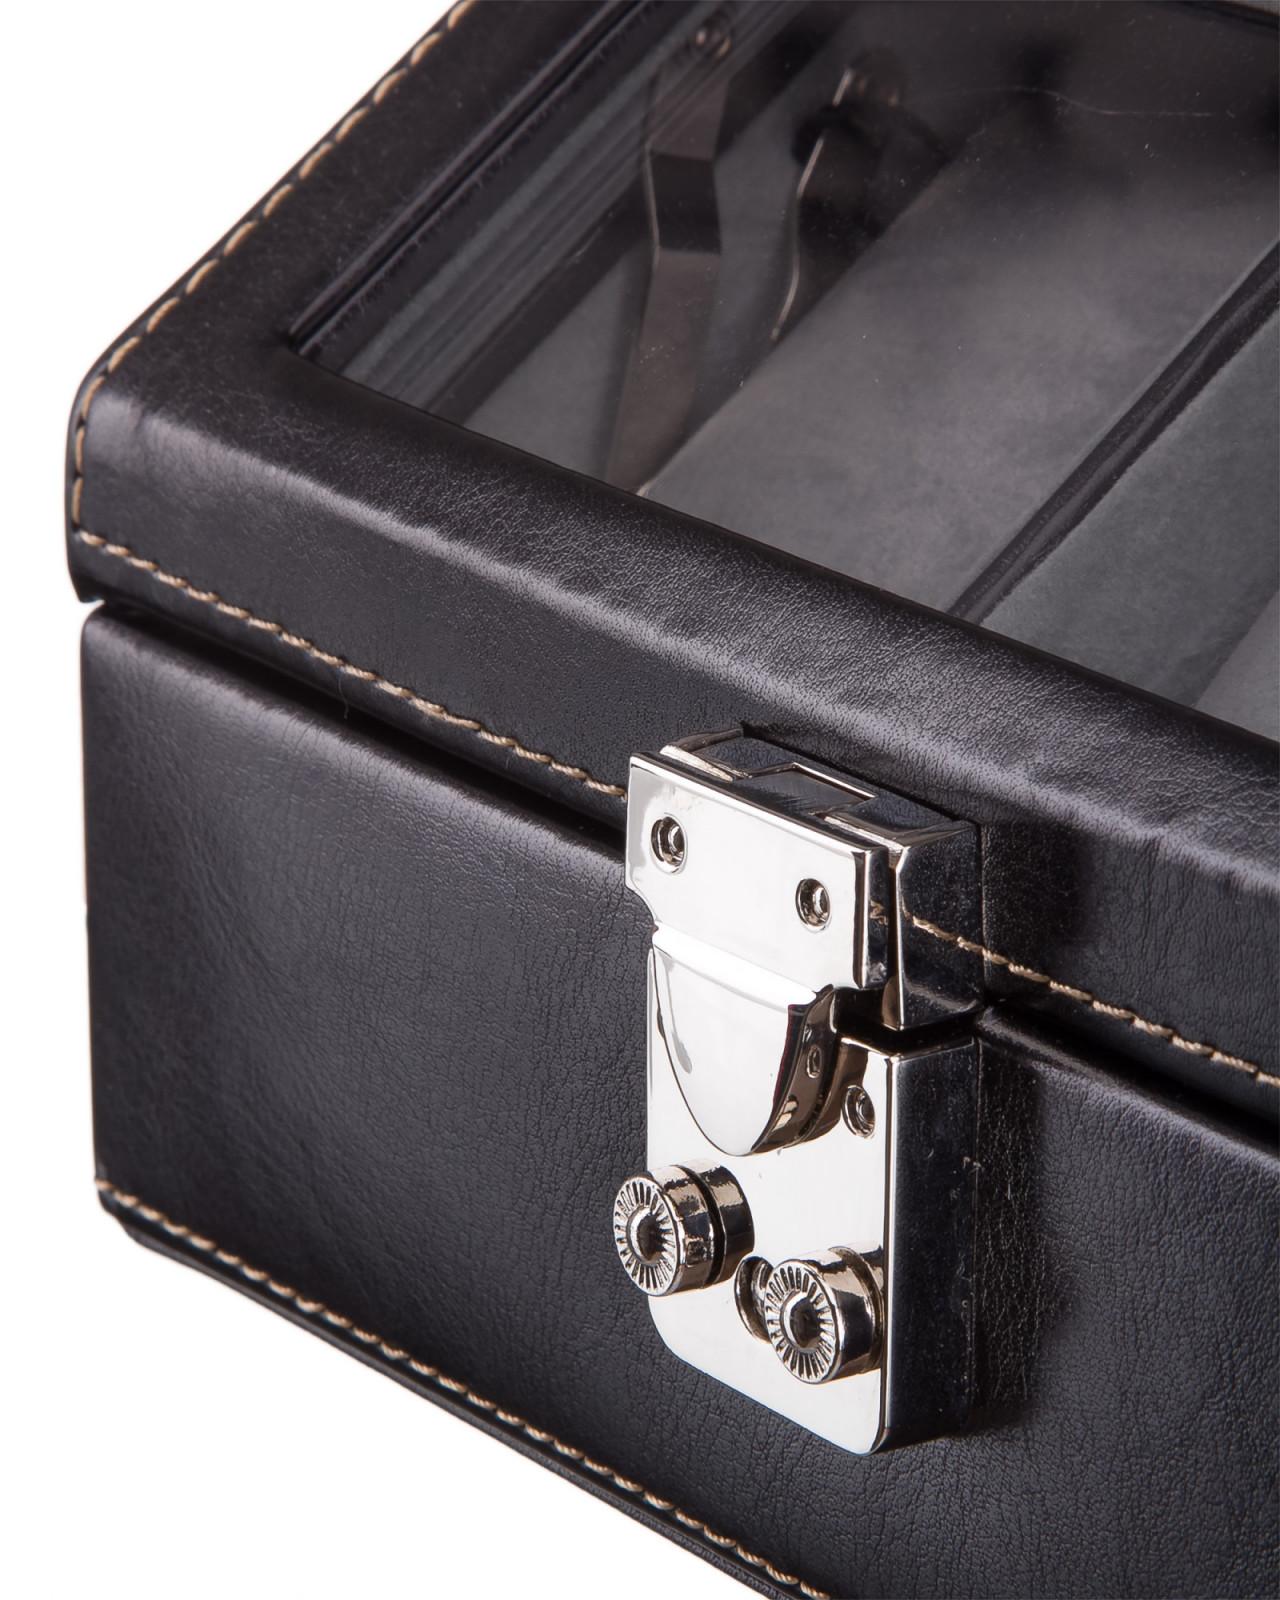 Шкатулка для часов S-8059-2N черный